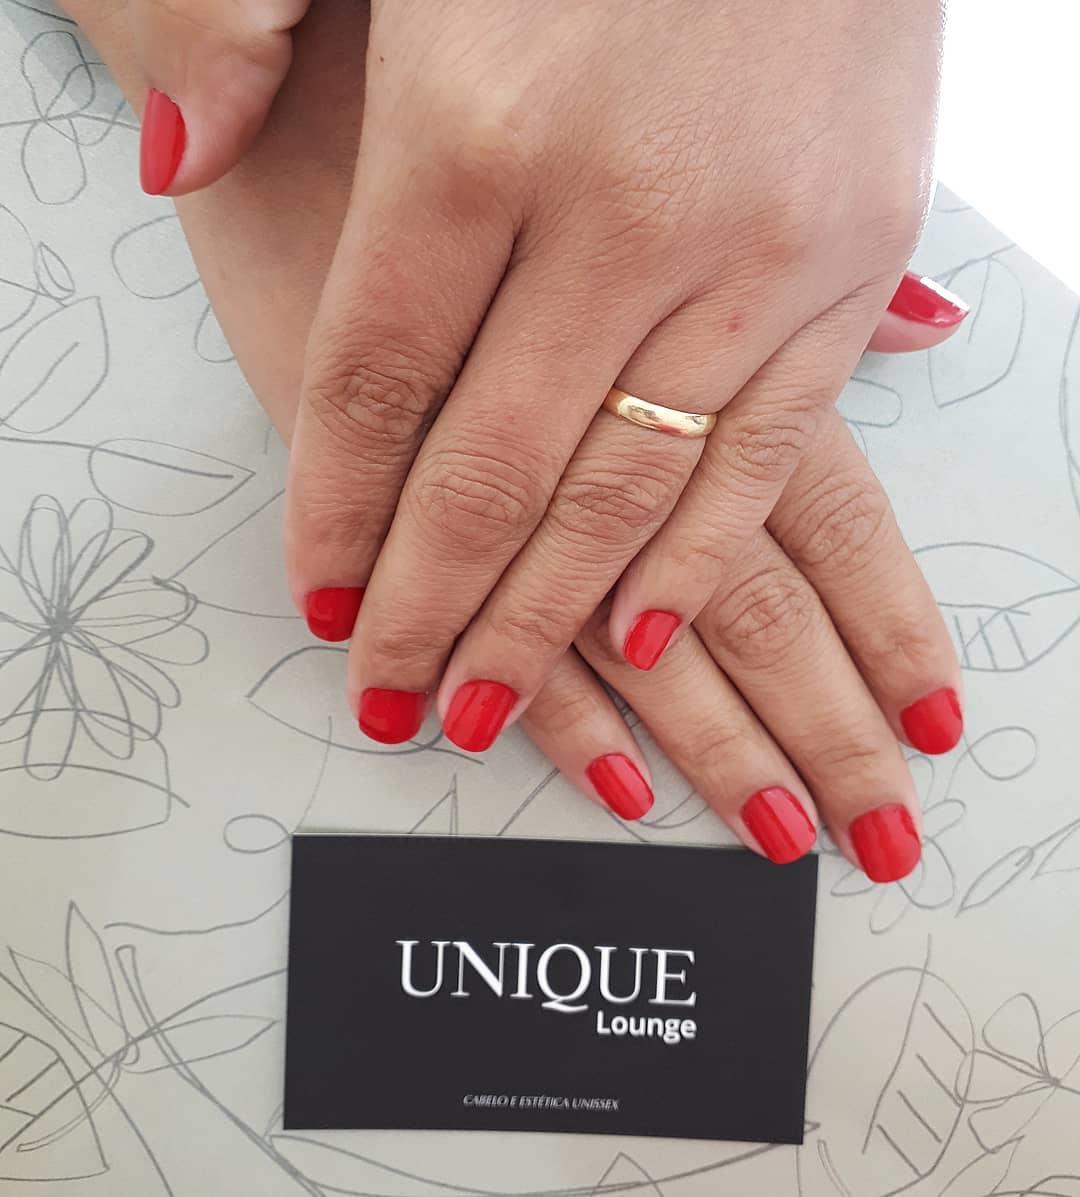 popular unique nail designs 2019 8 - Popular Unique Nail Designs 2019